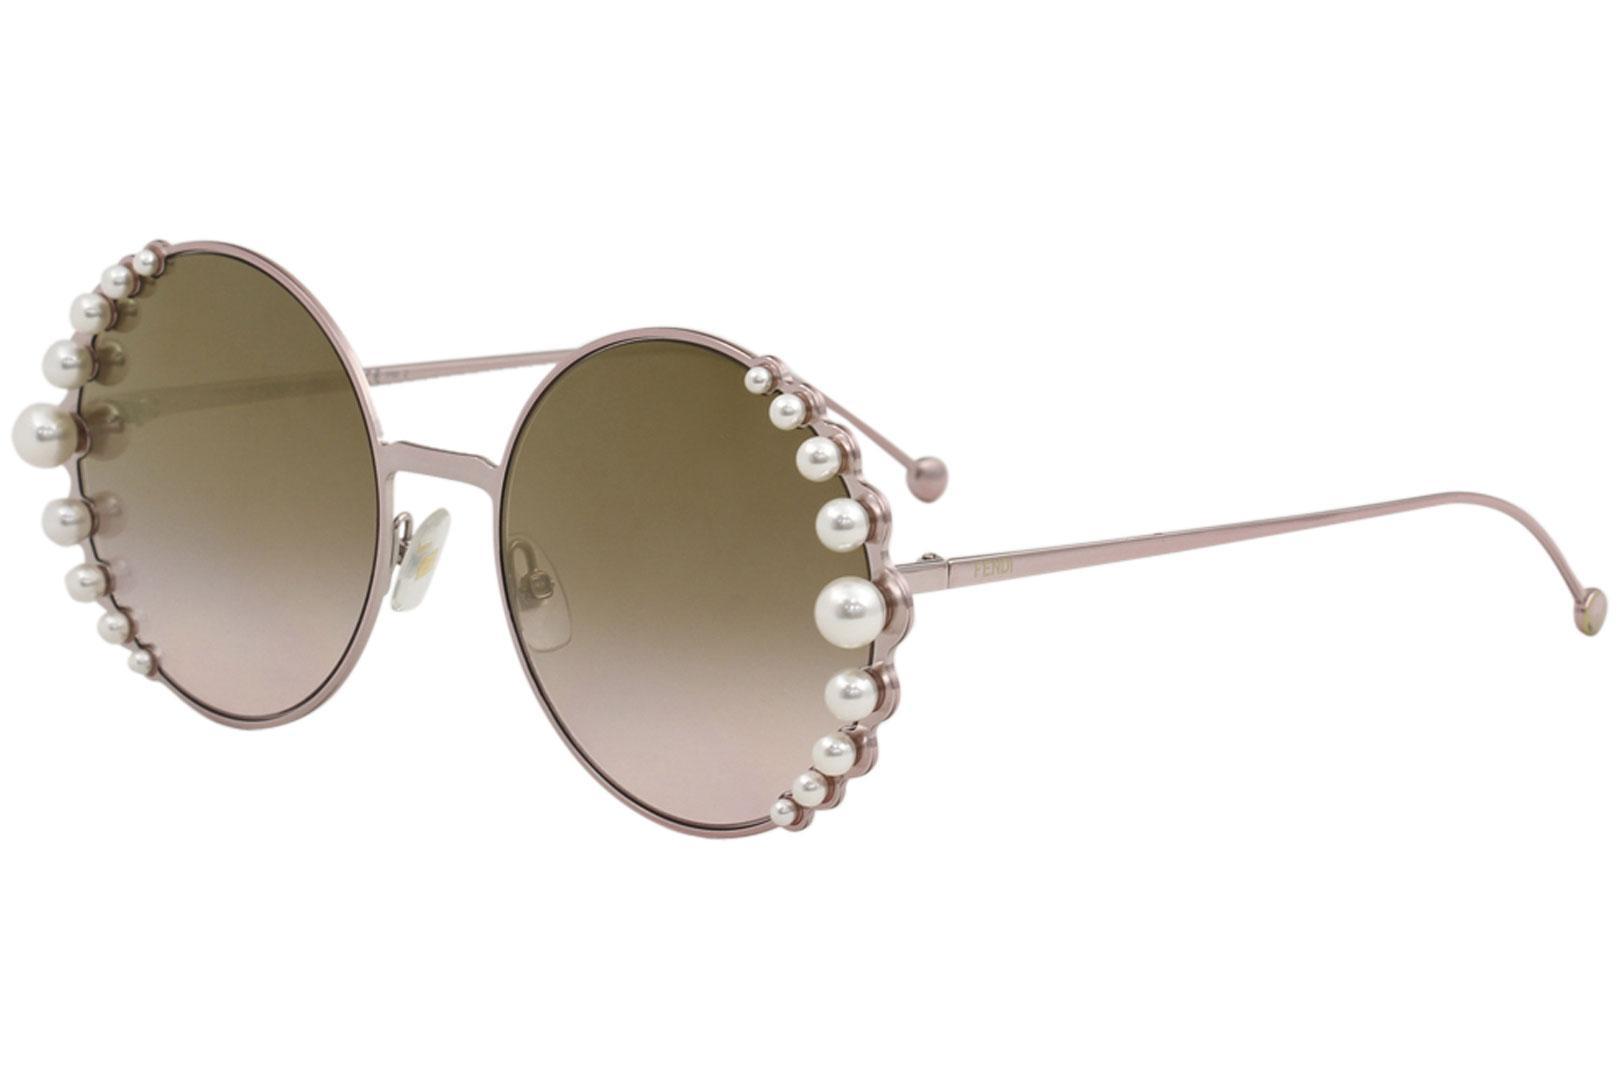 Fendi Women's FF0295S FF/0295/S 35J/53 Pink/Pearl Fashion Round Sunglasses 58mm